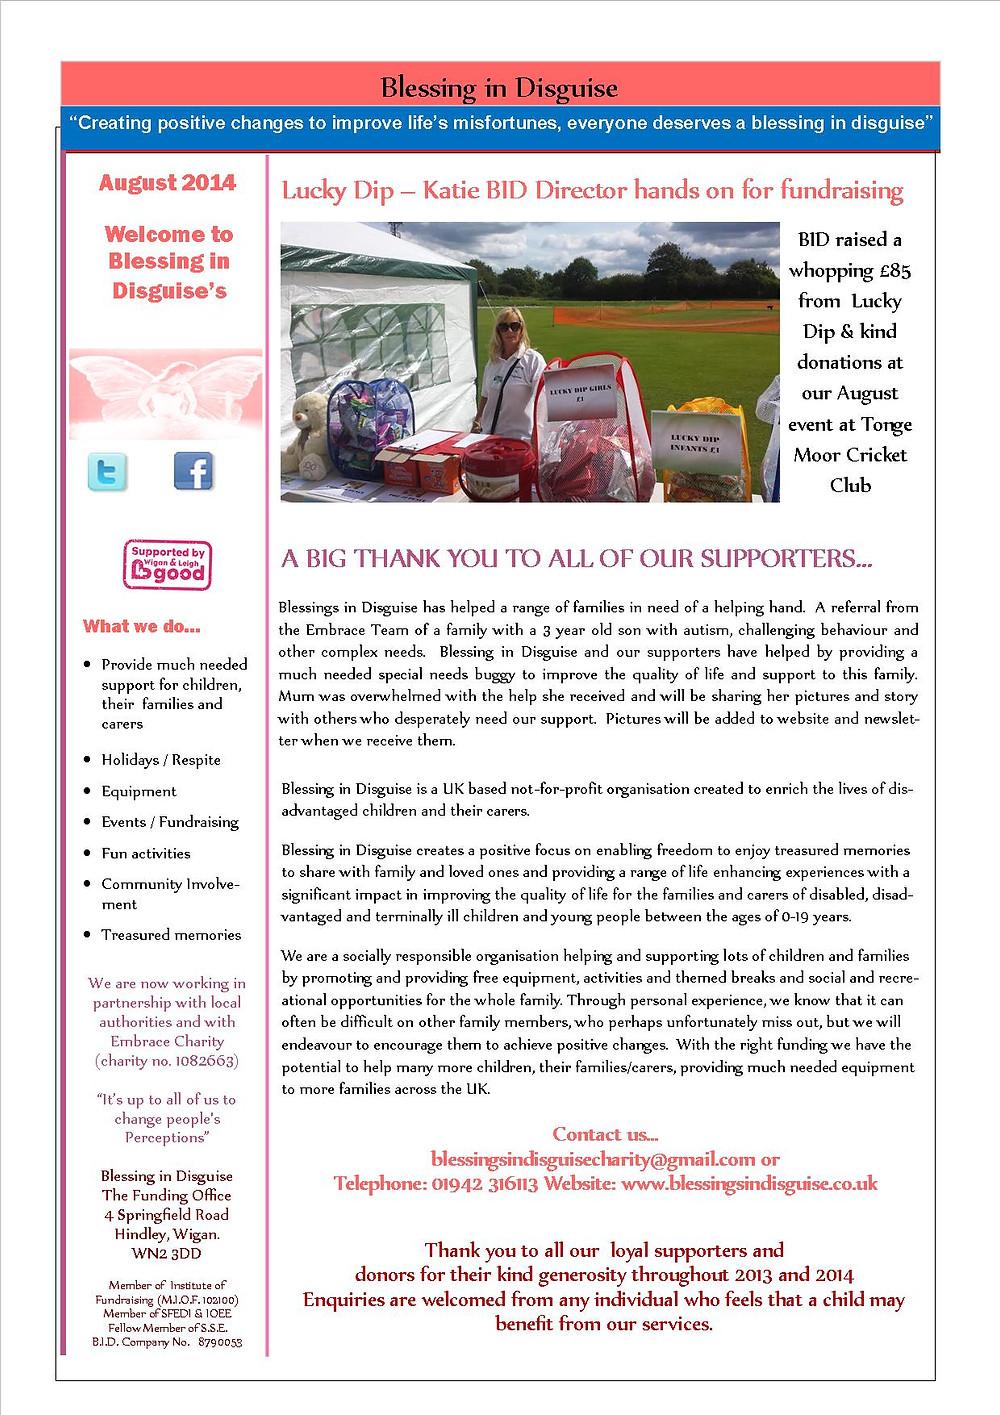 2014 08 - August newsletter page1.jpg